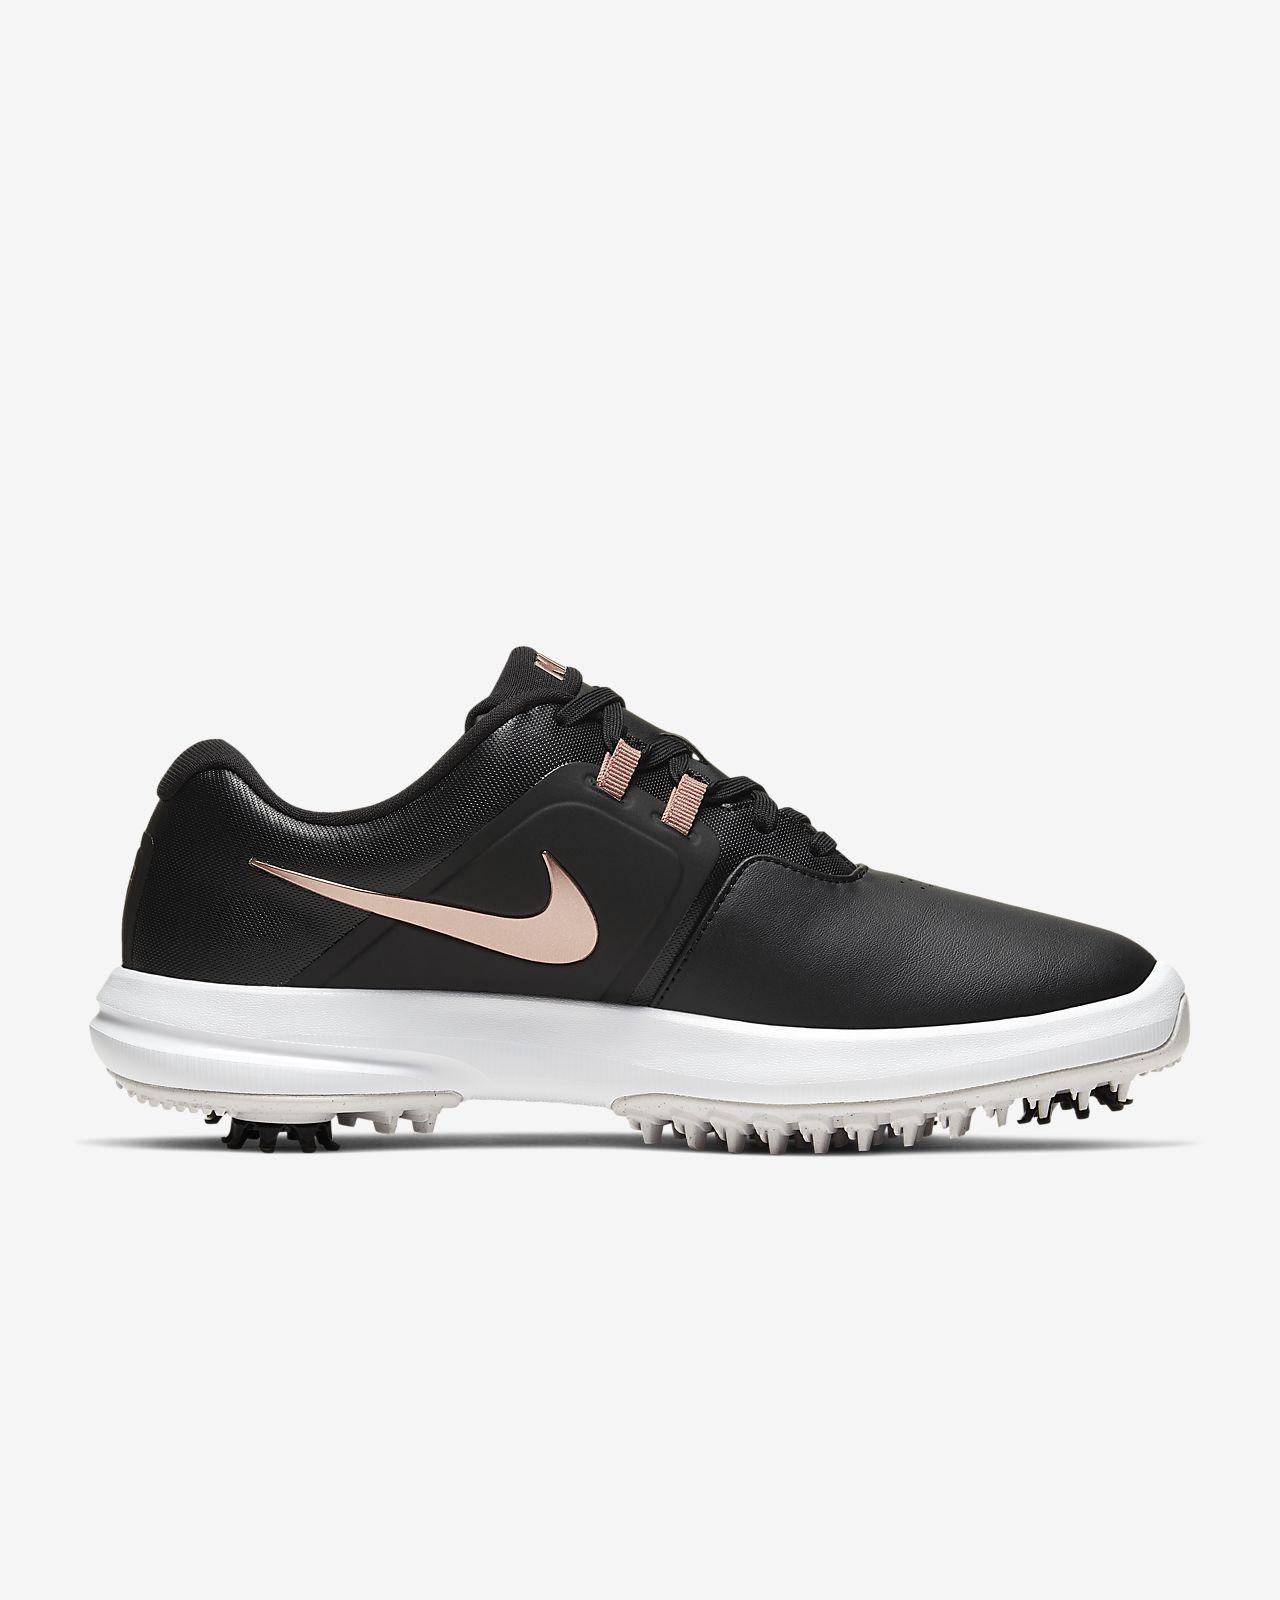 quality design ae064 a2252 ... Nike Air Zoom Victory Women s Golf Shoe